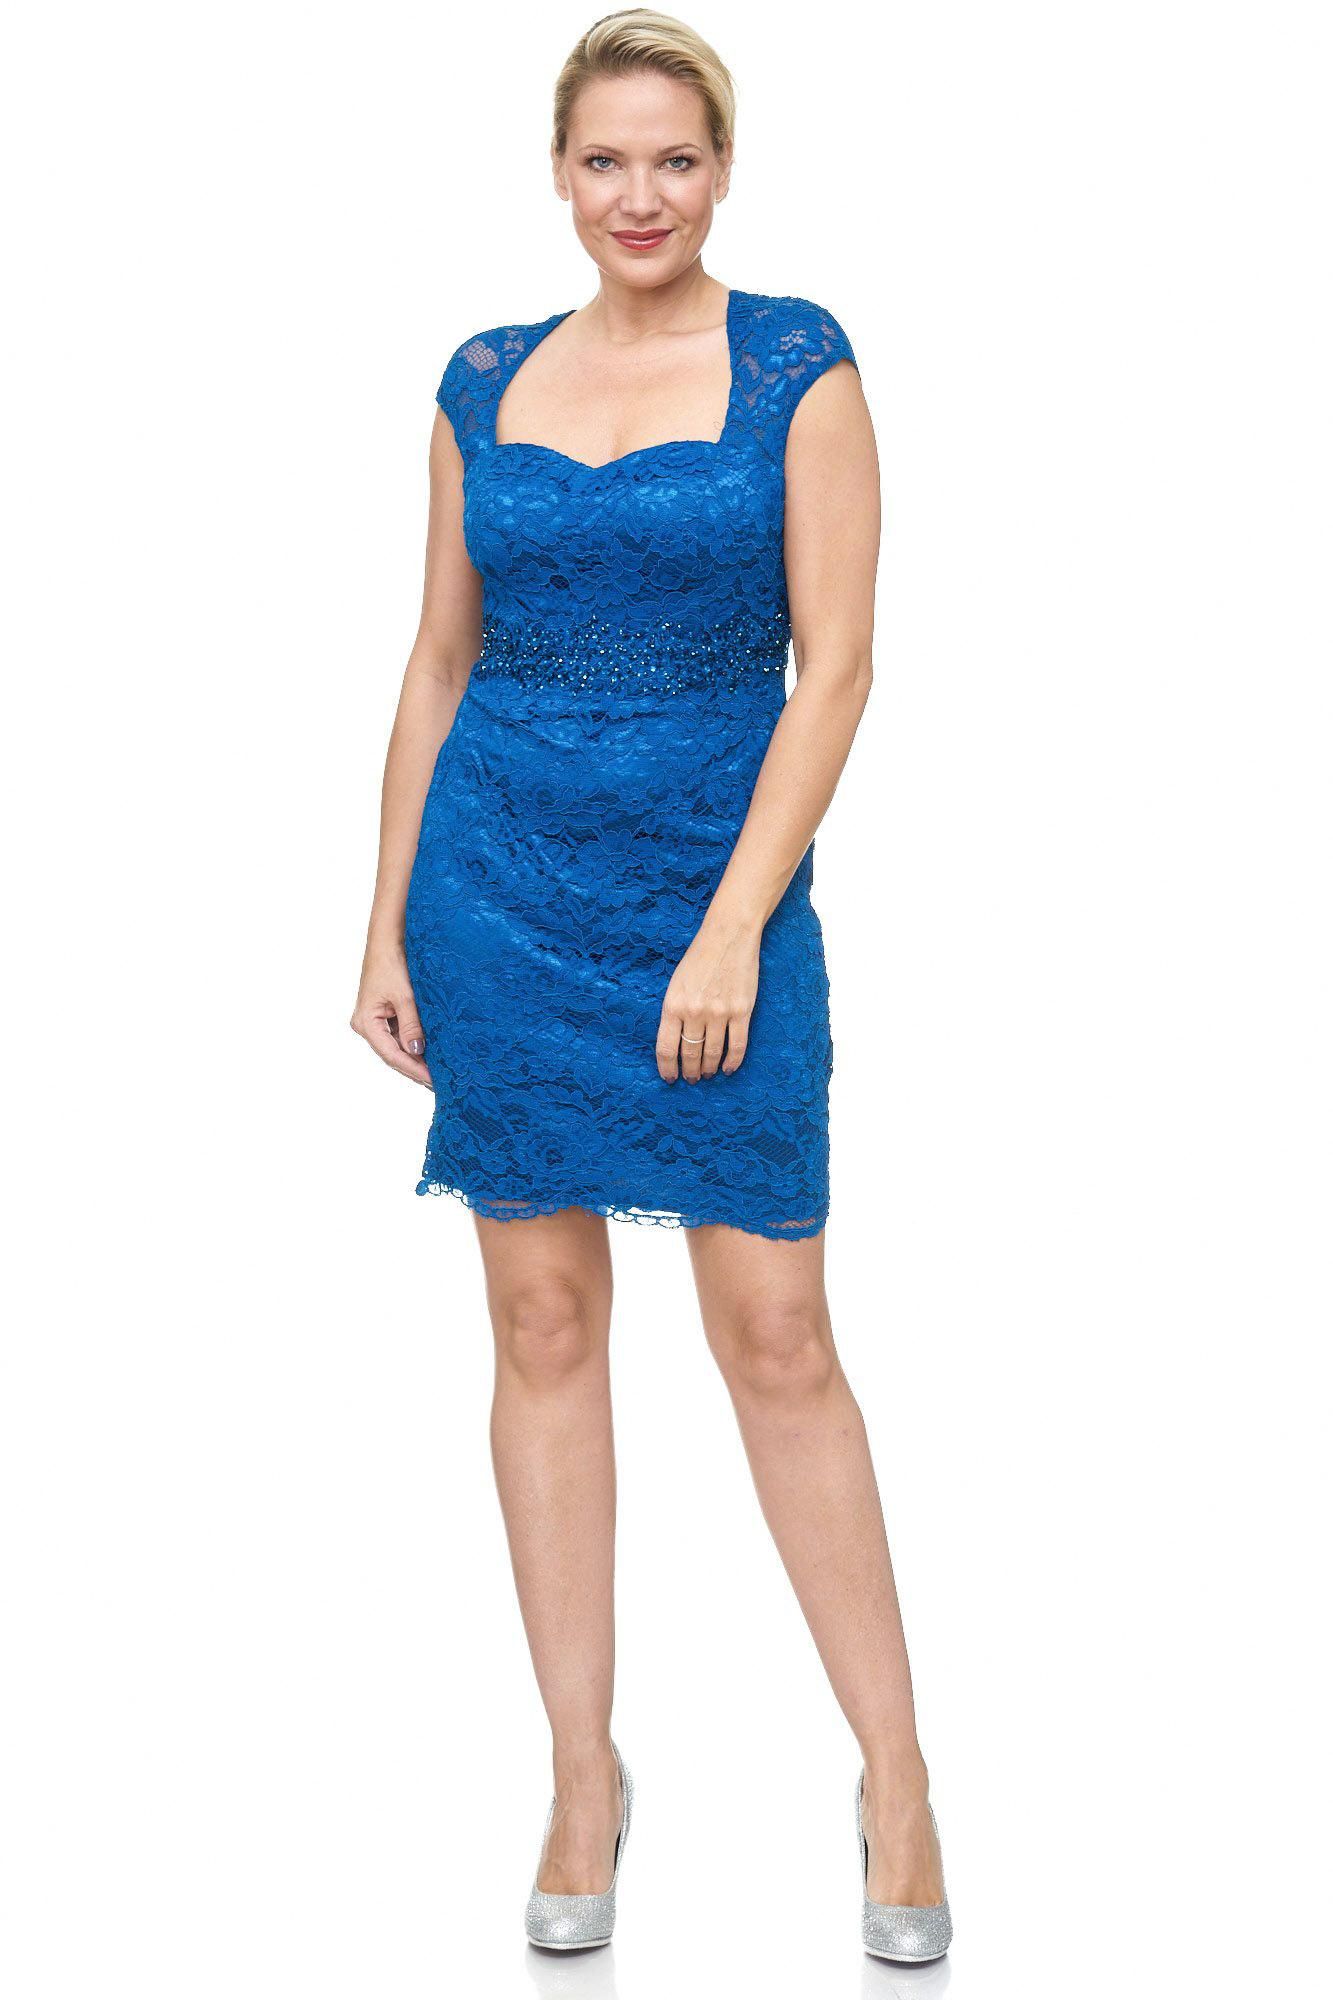 Blauwe Cocktailjurk.Floral Lace Cocktail Dress Plus Size Mini Dress